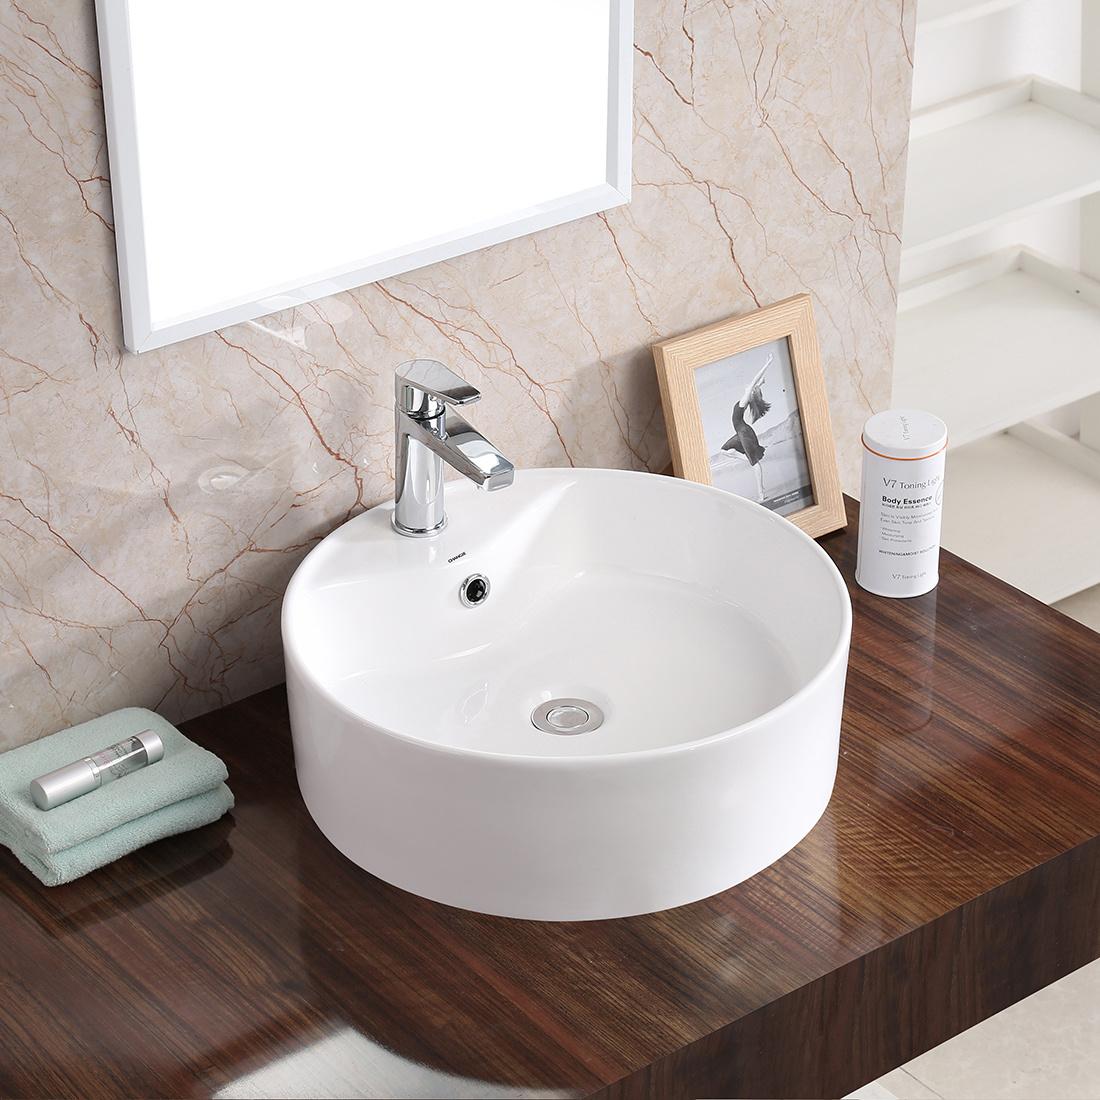 Vessel Sink with csa,washbasin,vanity sink (6004)